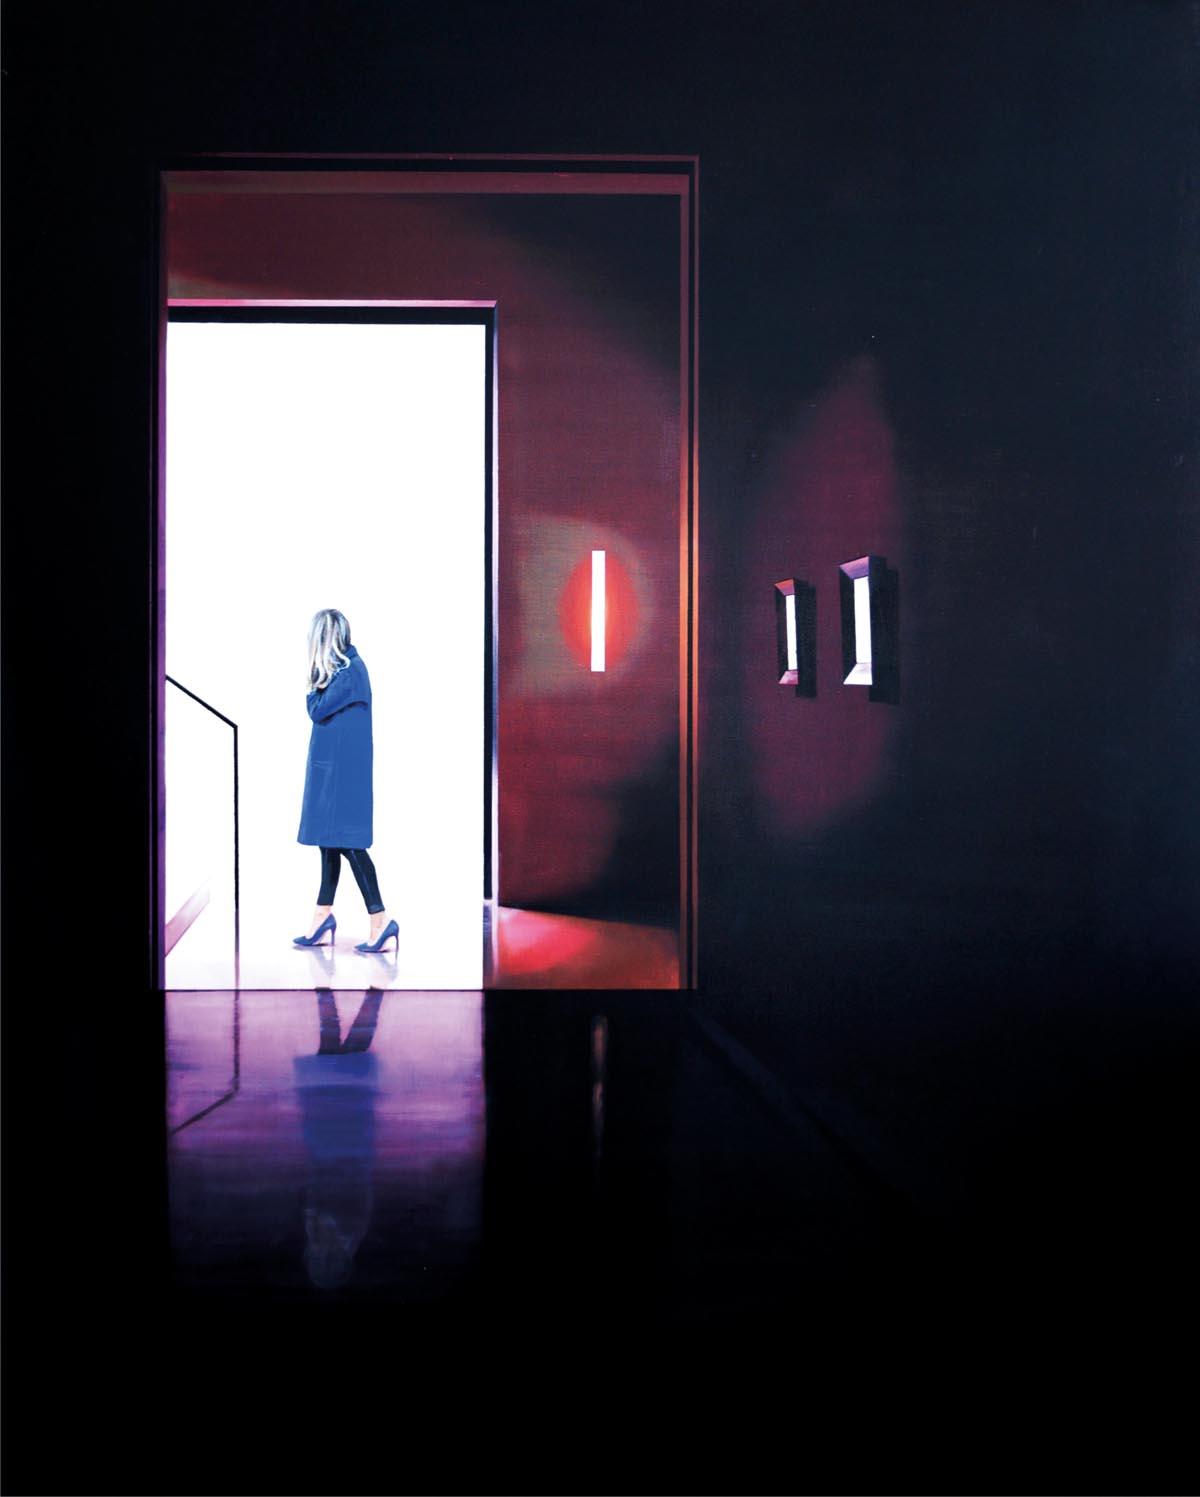 Mateusz Maliborski, Muzeum LXVI, 100x80 cm, olej, płótno, artysta i sztuka 23